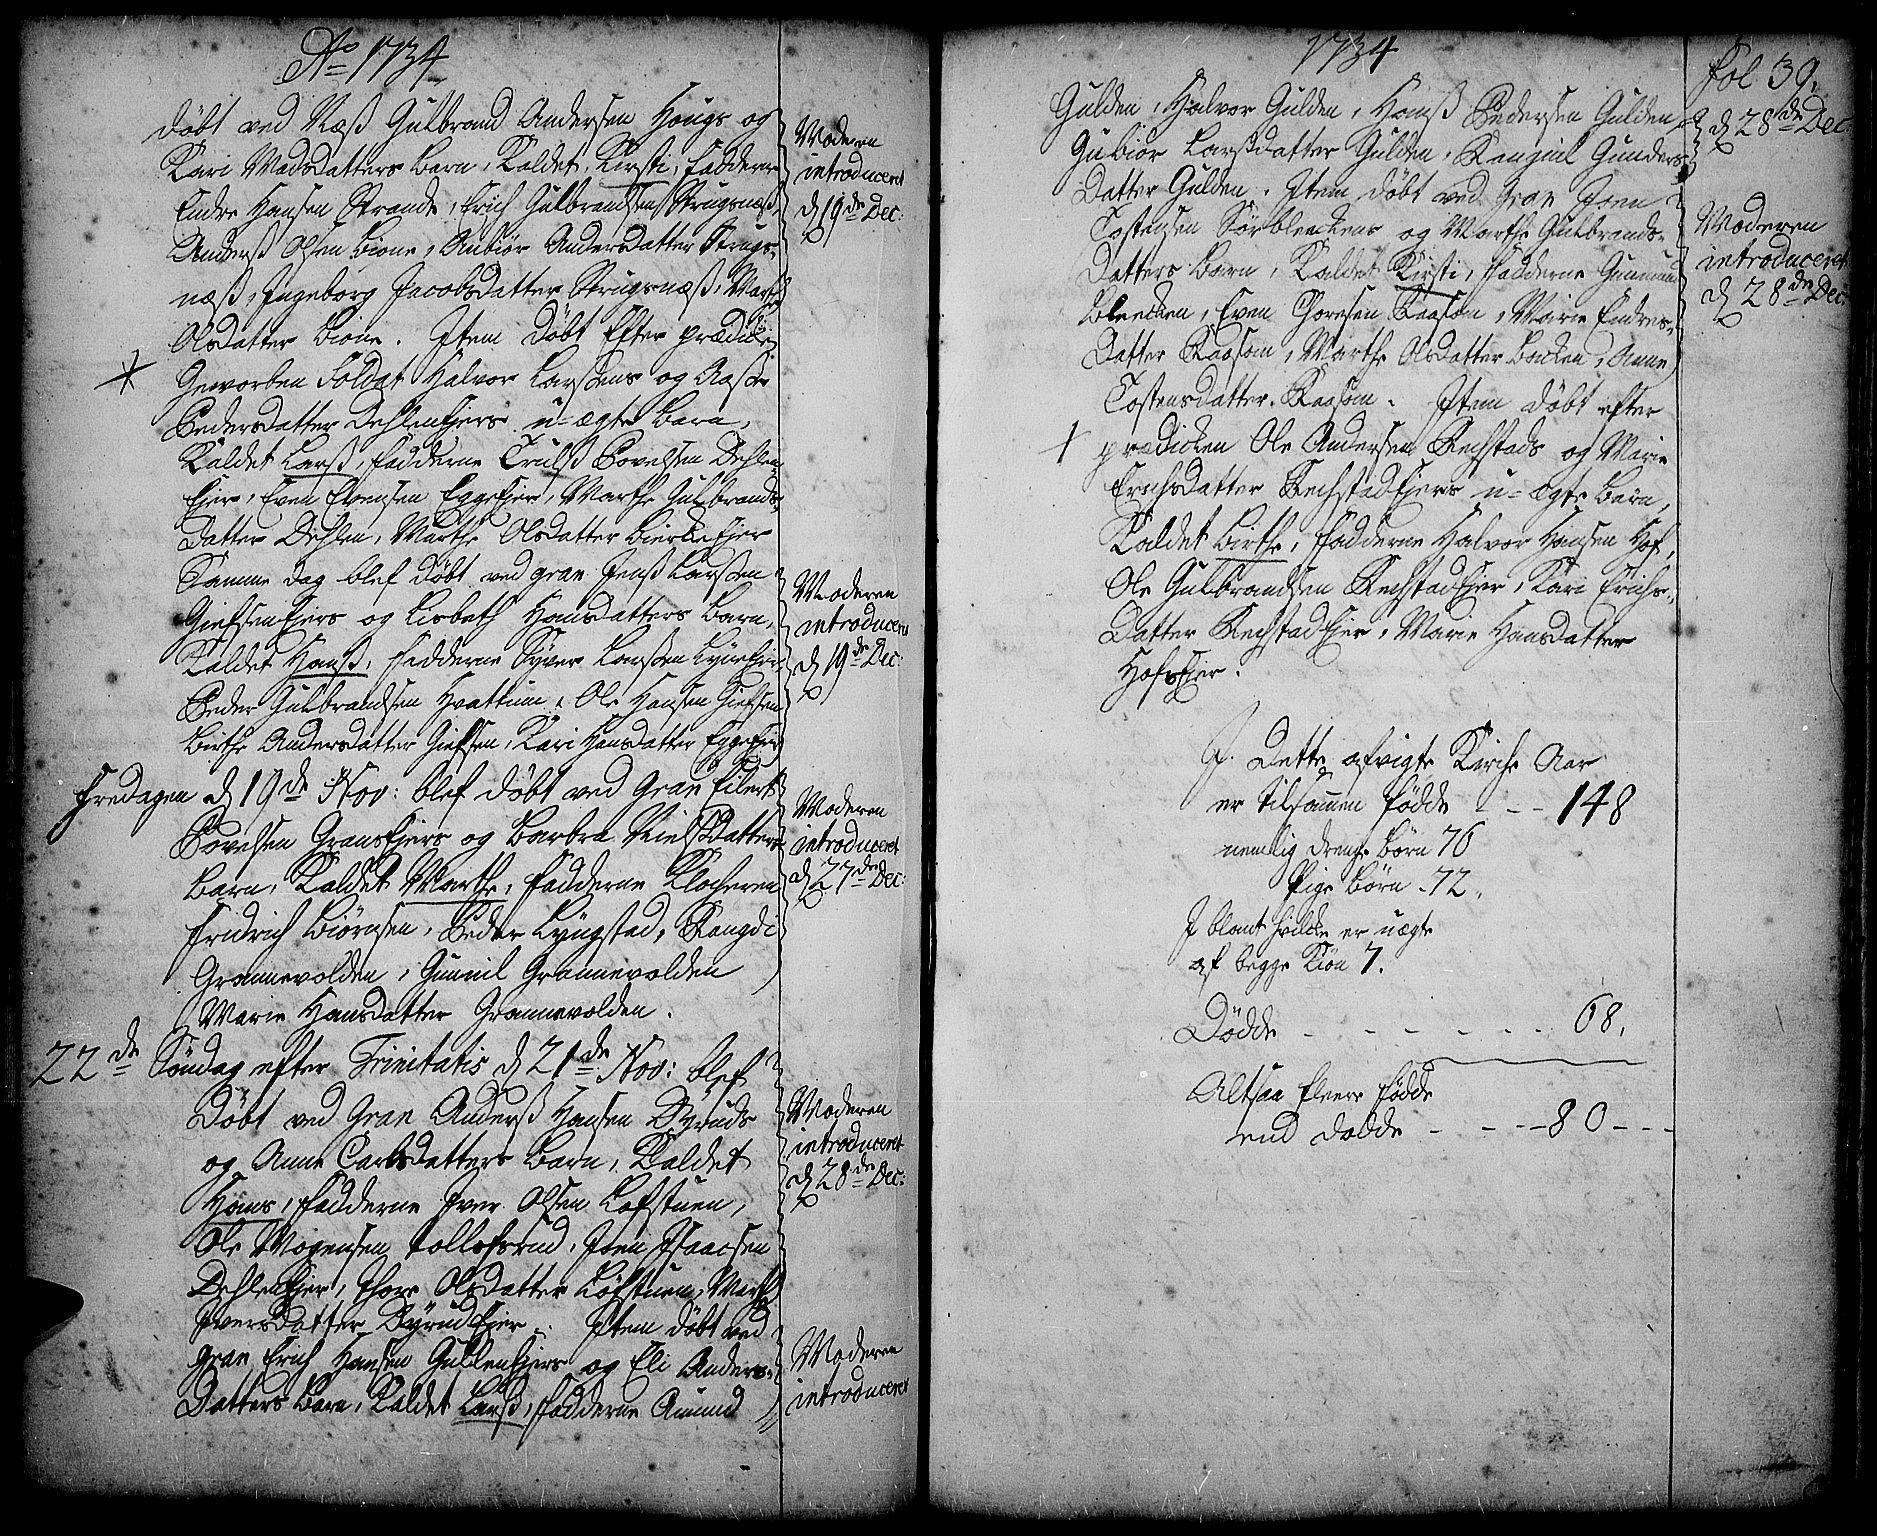 SAH, Gran prestekontor, Ministerialbok nr. 2, 1732-1744, s. 39